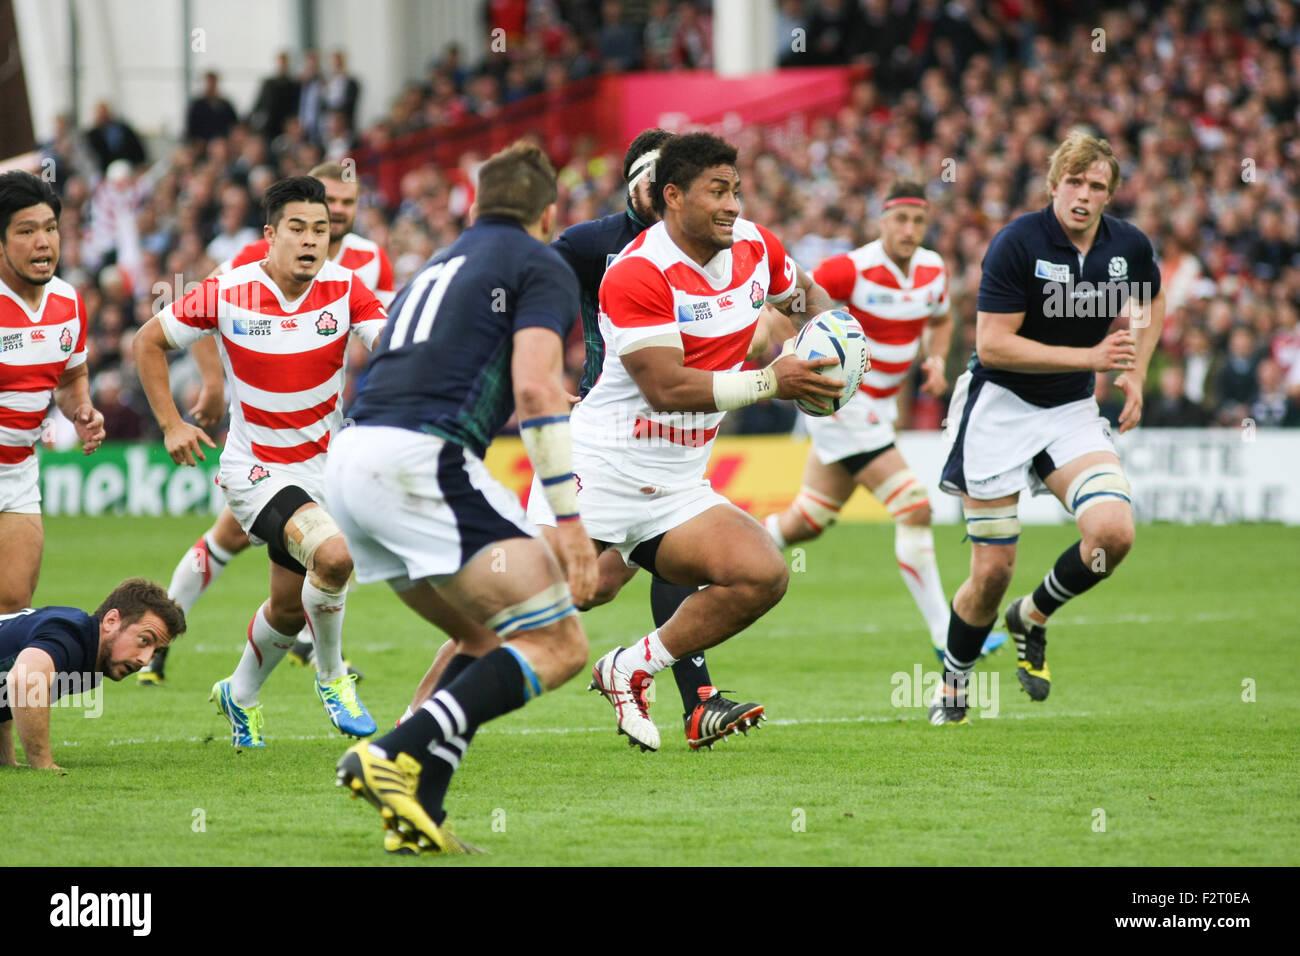 Gloucester, UK. 23rd September, 2015. Rugby World Cup 2015 - Scotland versus Japan, played at Kingsholm stadium, - Stock Image